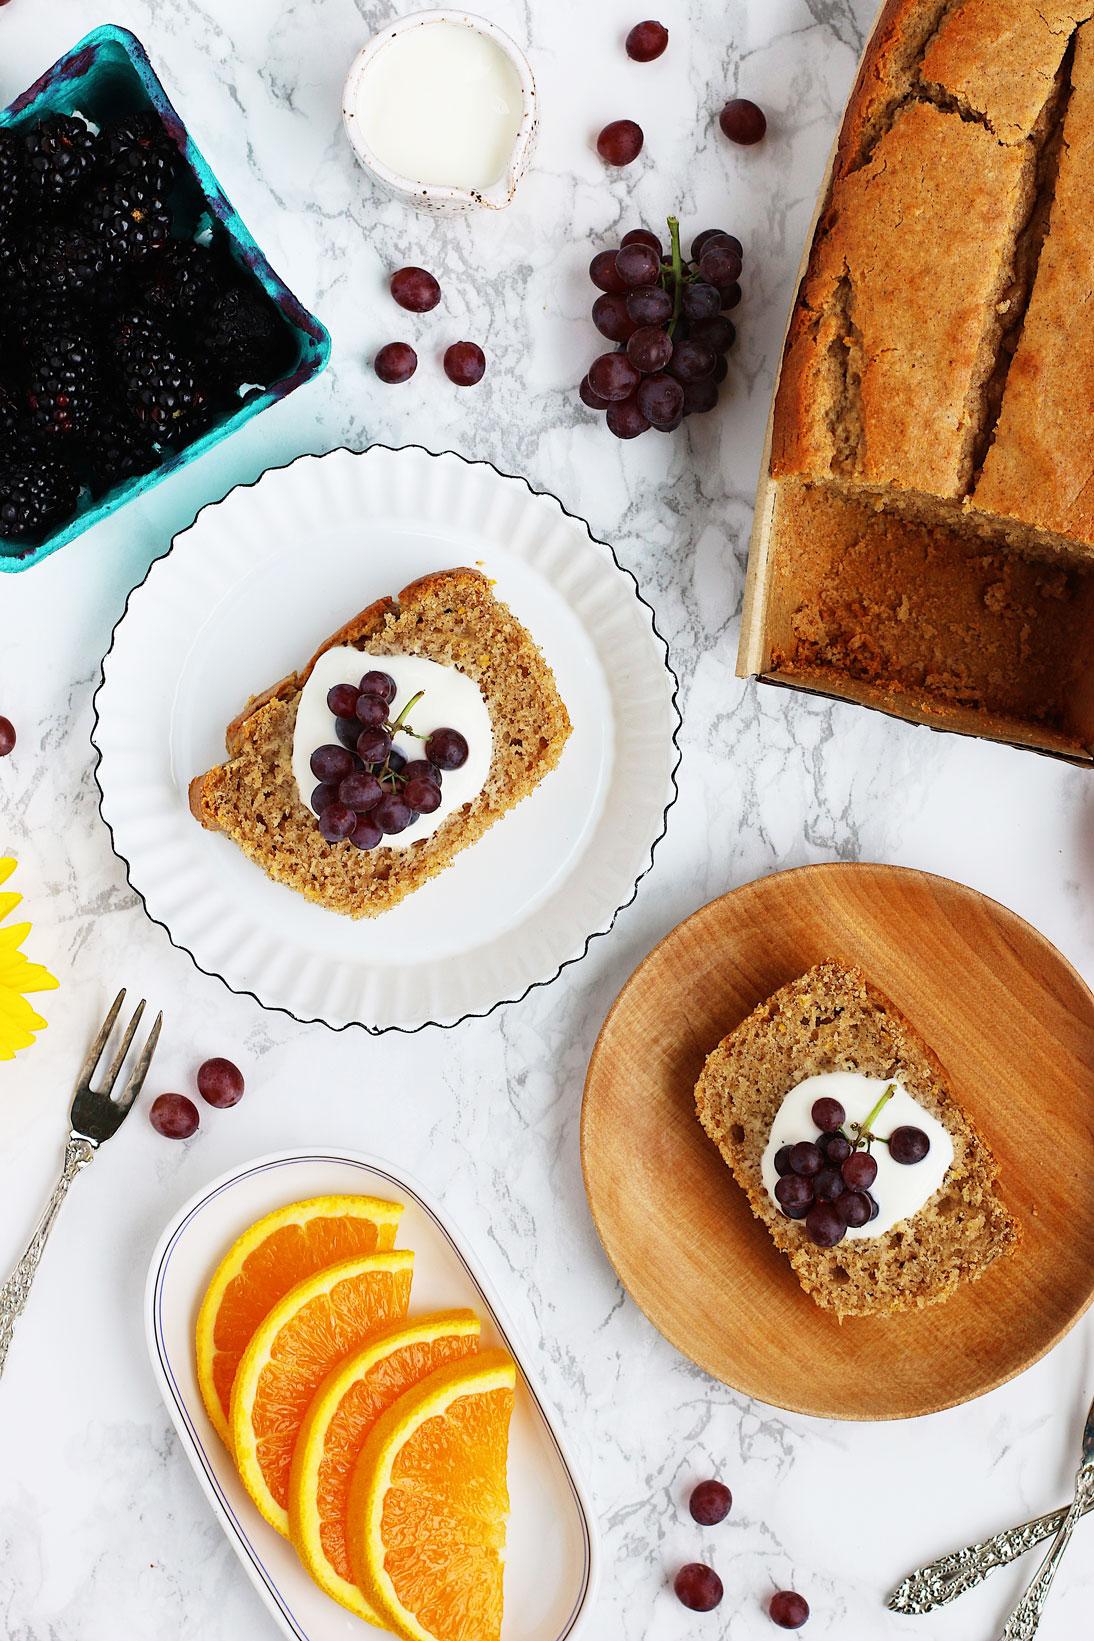 herbakinglab-orange-cardamom-yogurt-loaf-cake-on-plates